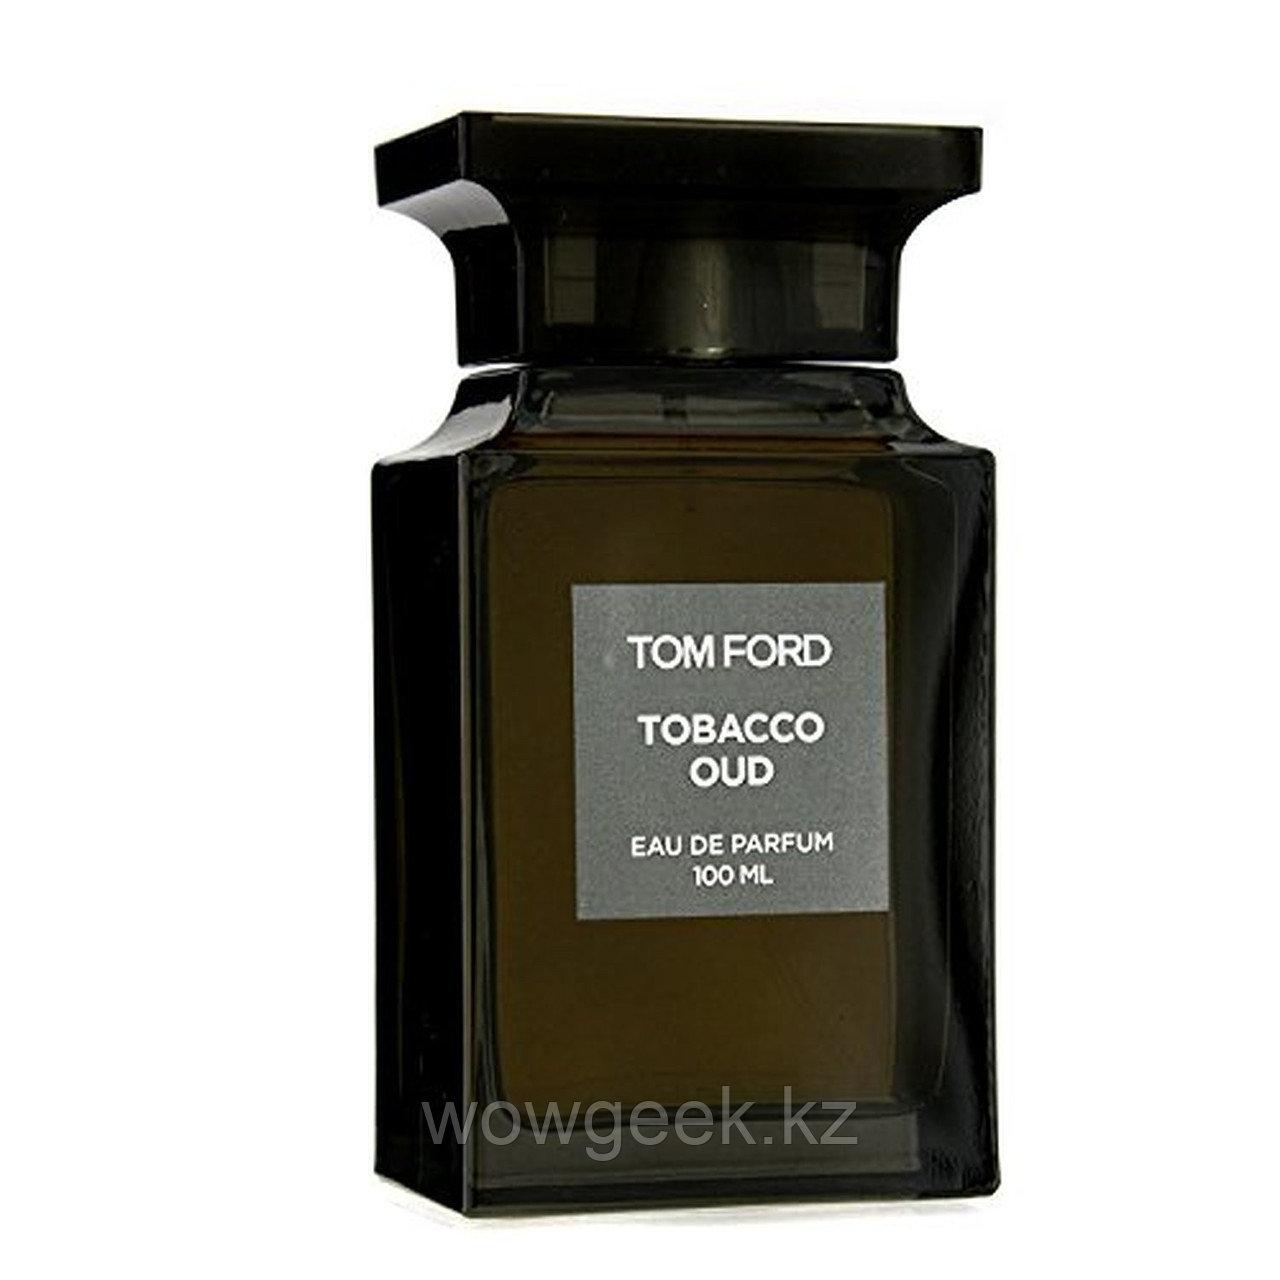 Tom Ford Tobacco Oud Мужской парфюм